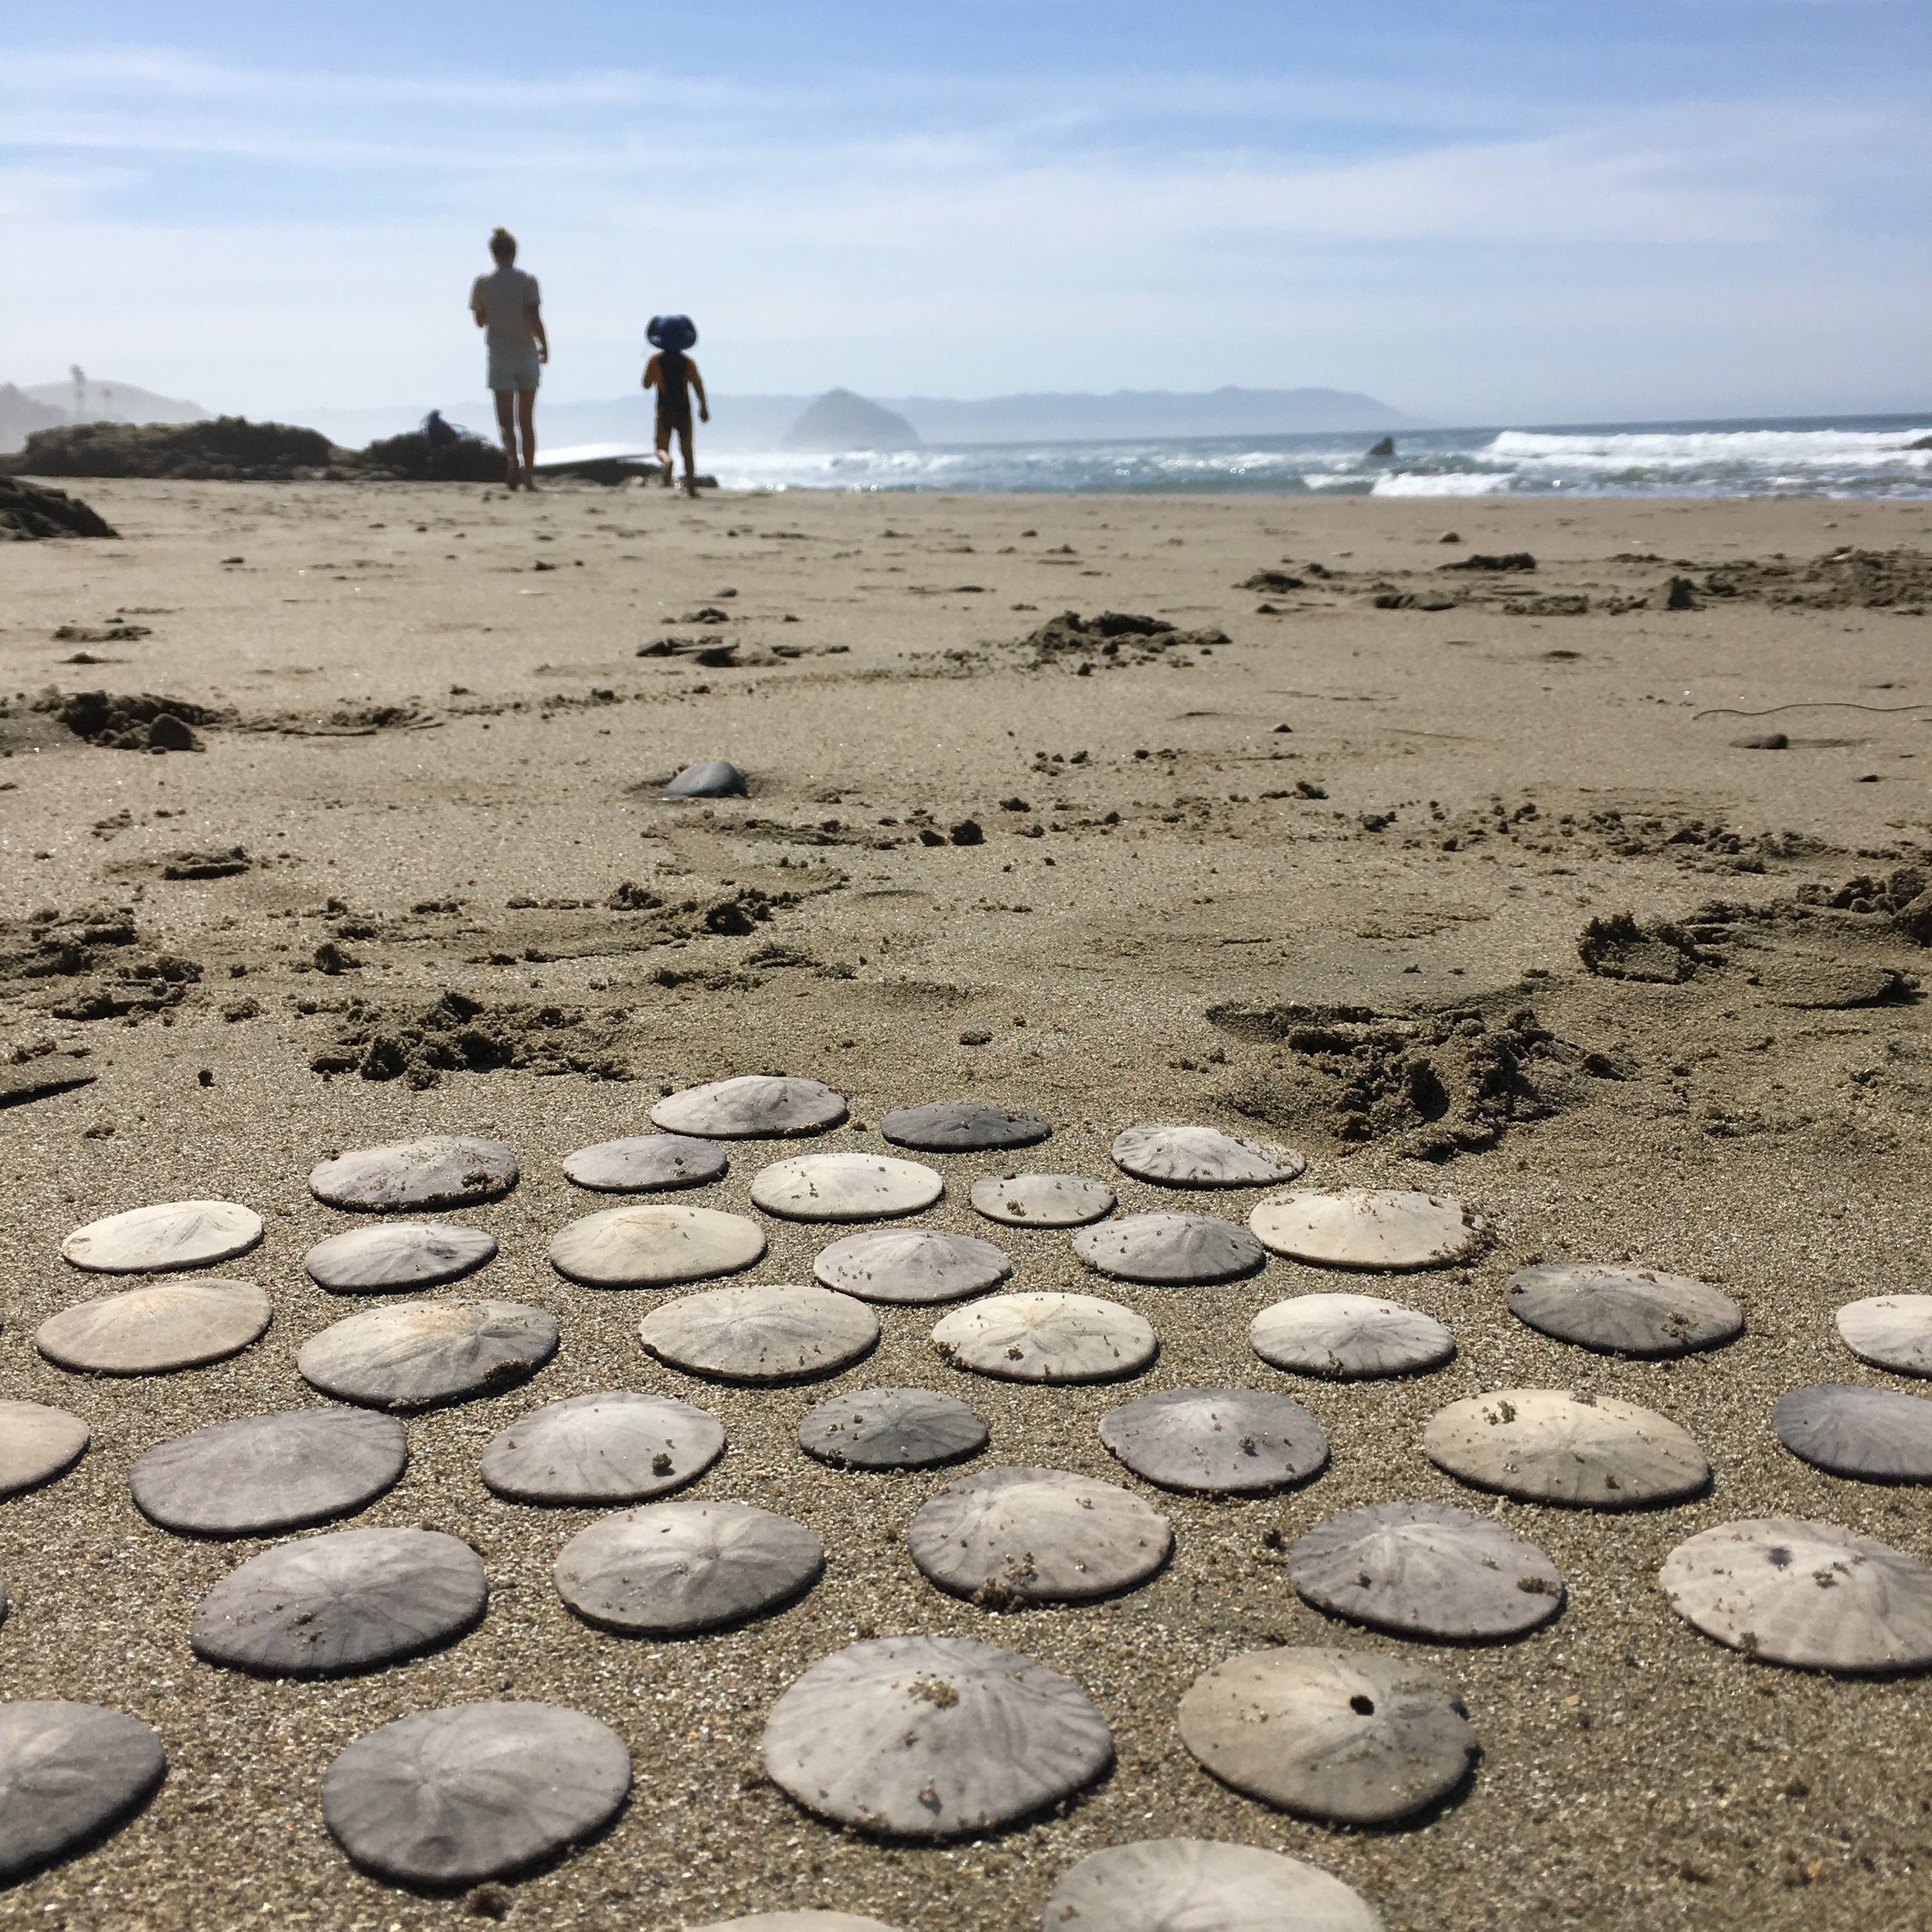 Beach walk and sand dollars for family adventure via bluecorduroy.com